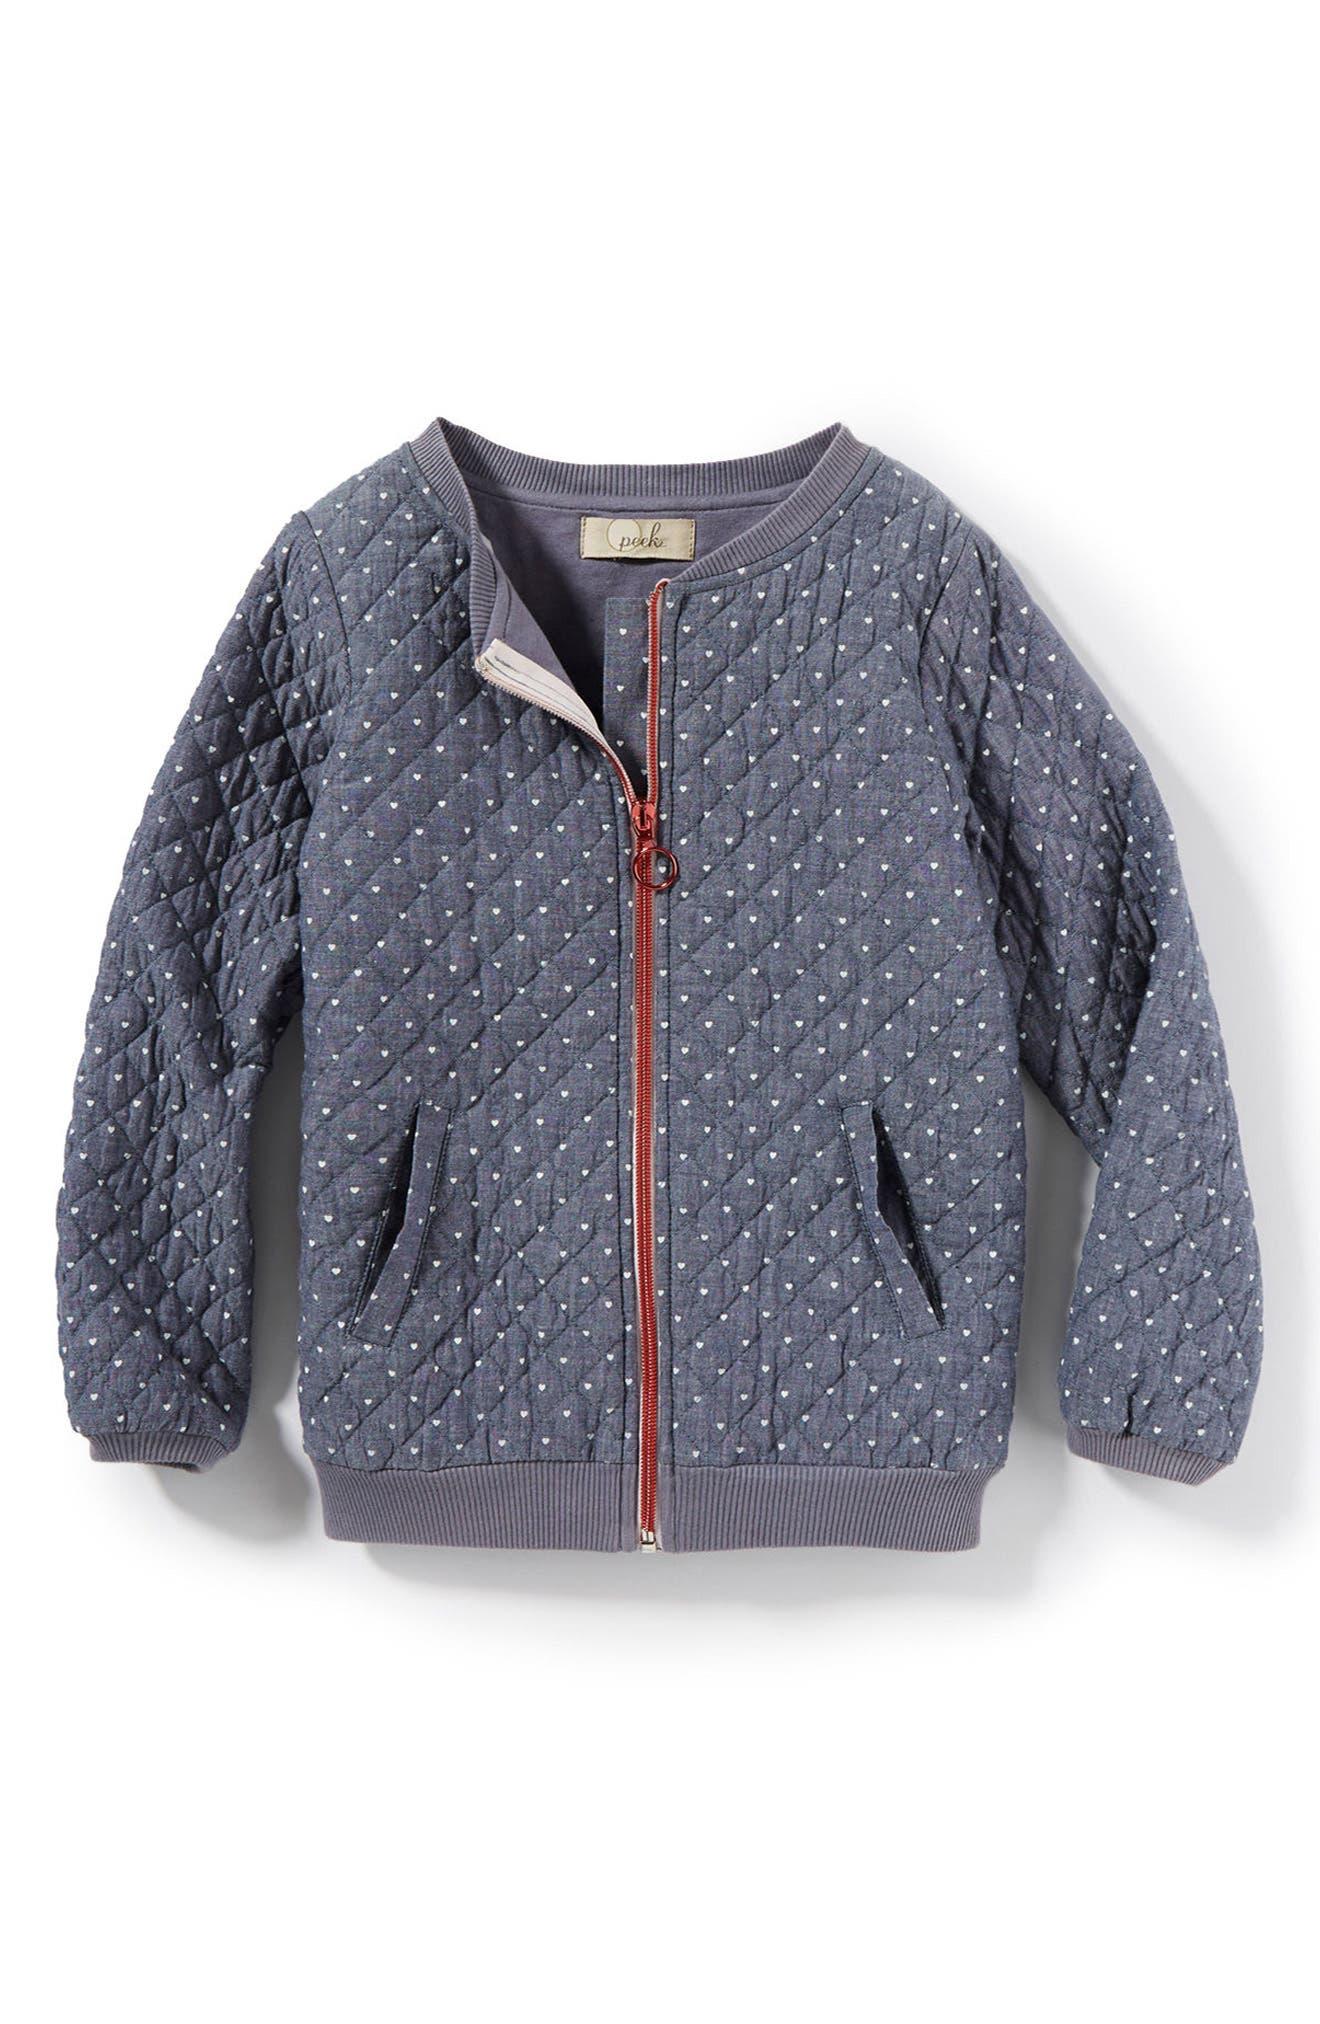 Main Image - Peek Heart Print Quilted Jacket (Toddler Girls, Little Girls & Big Girls)